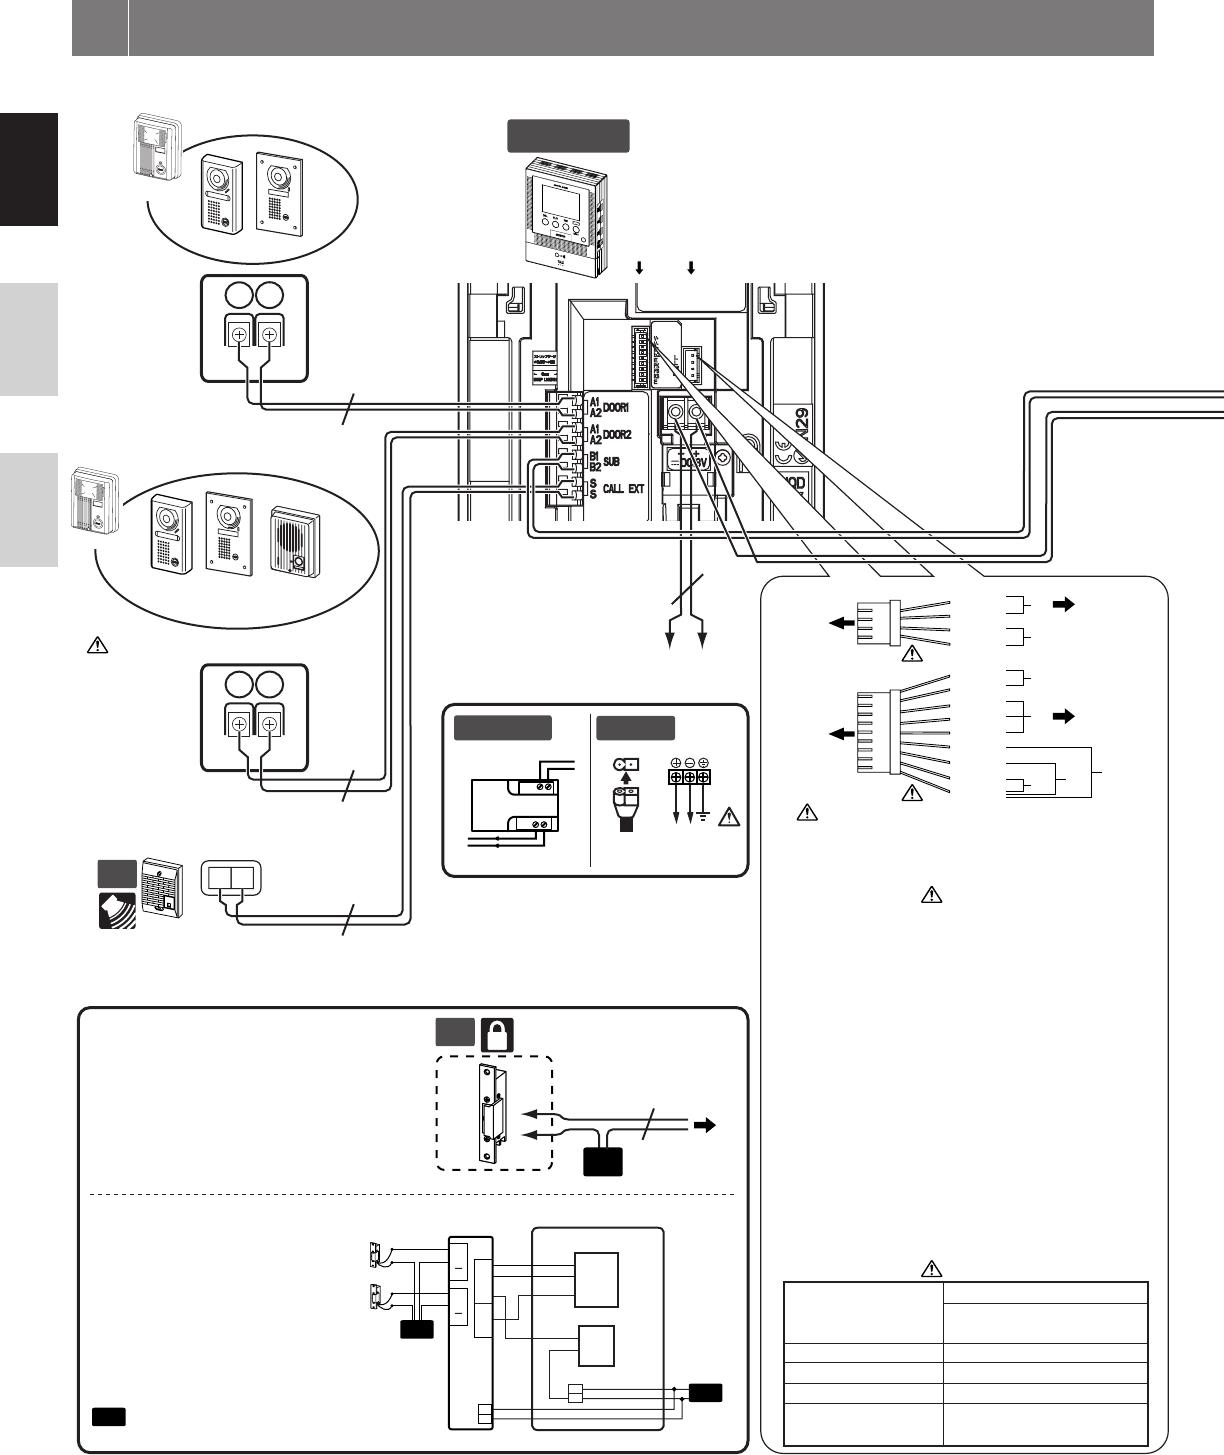 ellies intercom wiring diagram